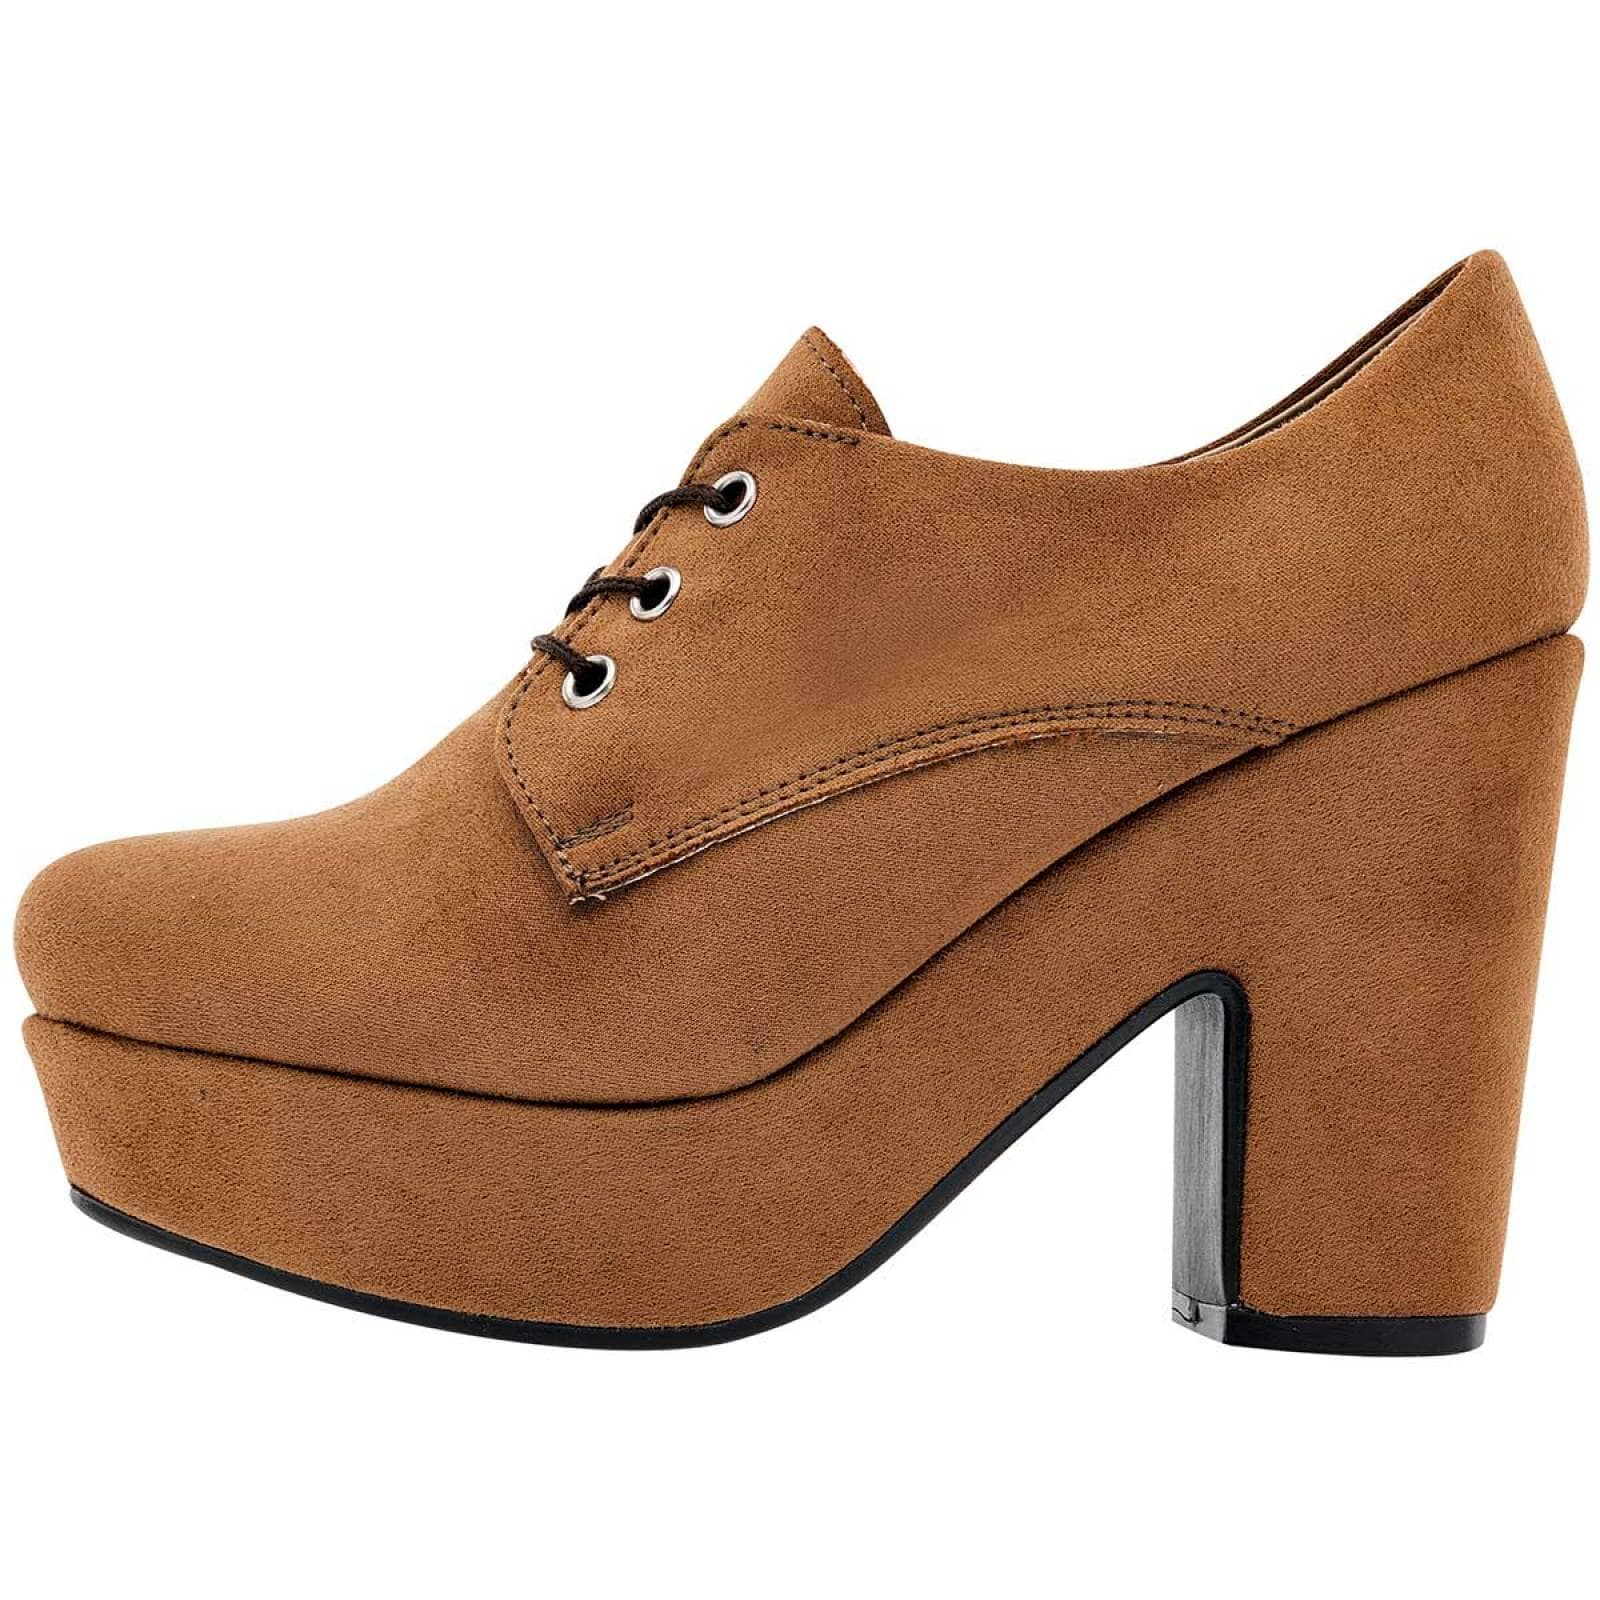 Lital liyu Zapato Mujer Camel